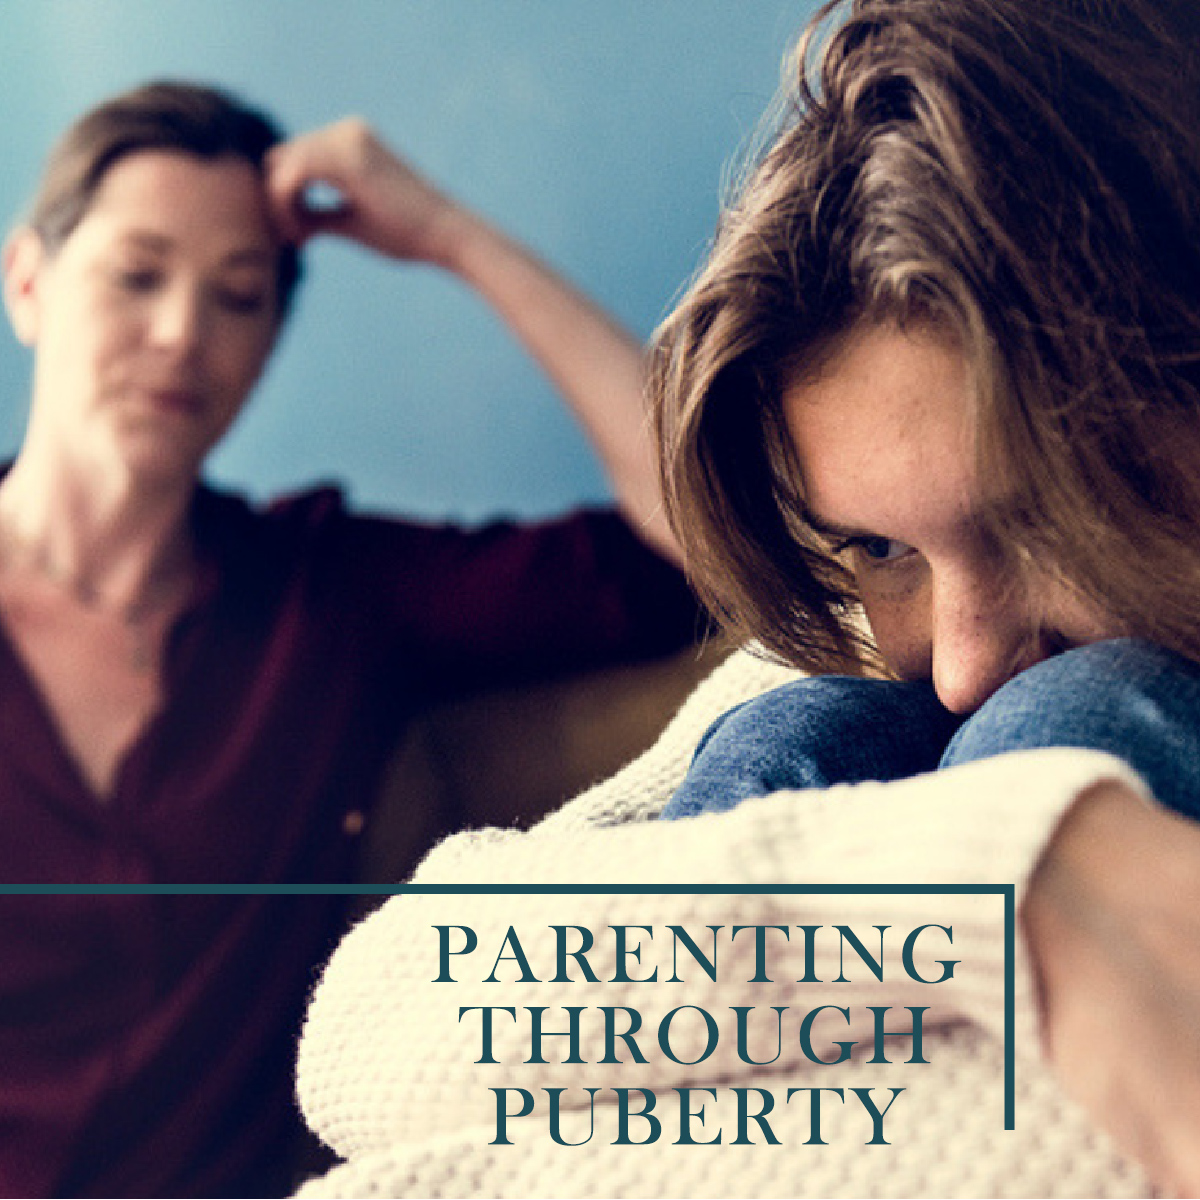 Parenting through puberty.jpg